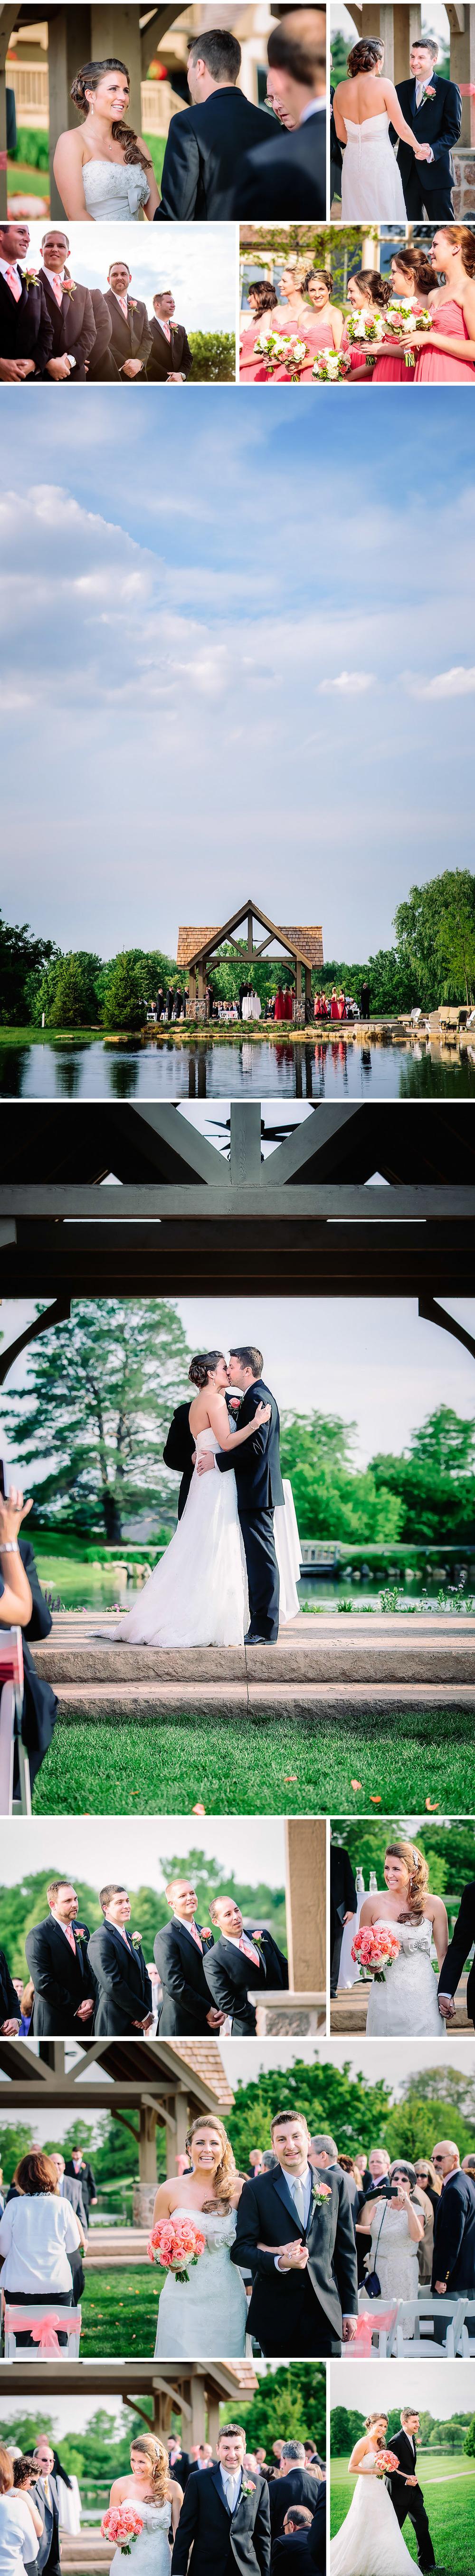 Chicago_Fine_Art_Wedding_Photography_olson4